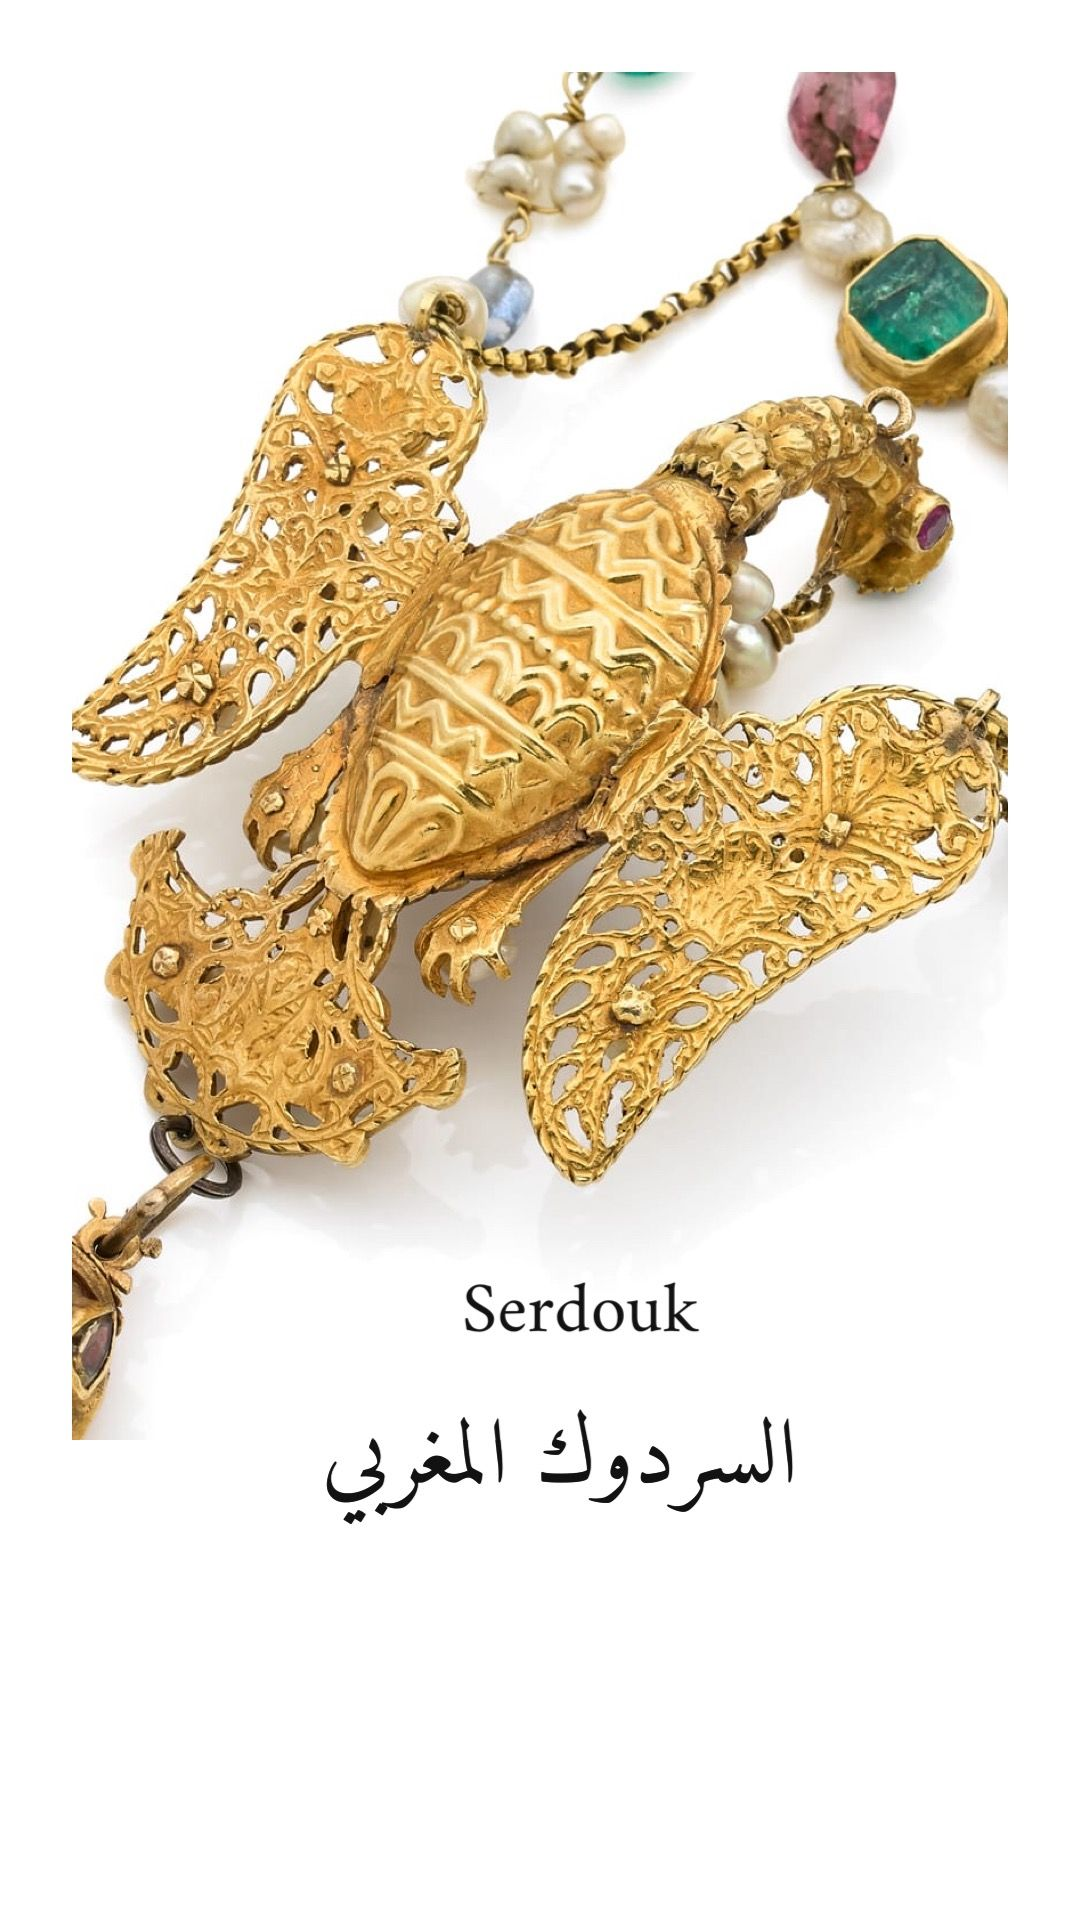 Moroccan Necklace Serdouk 2020